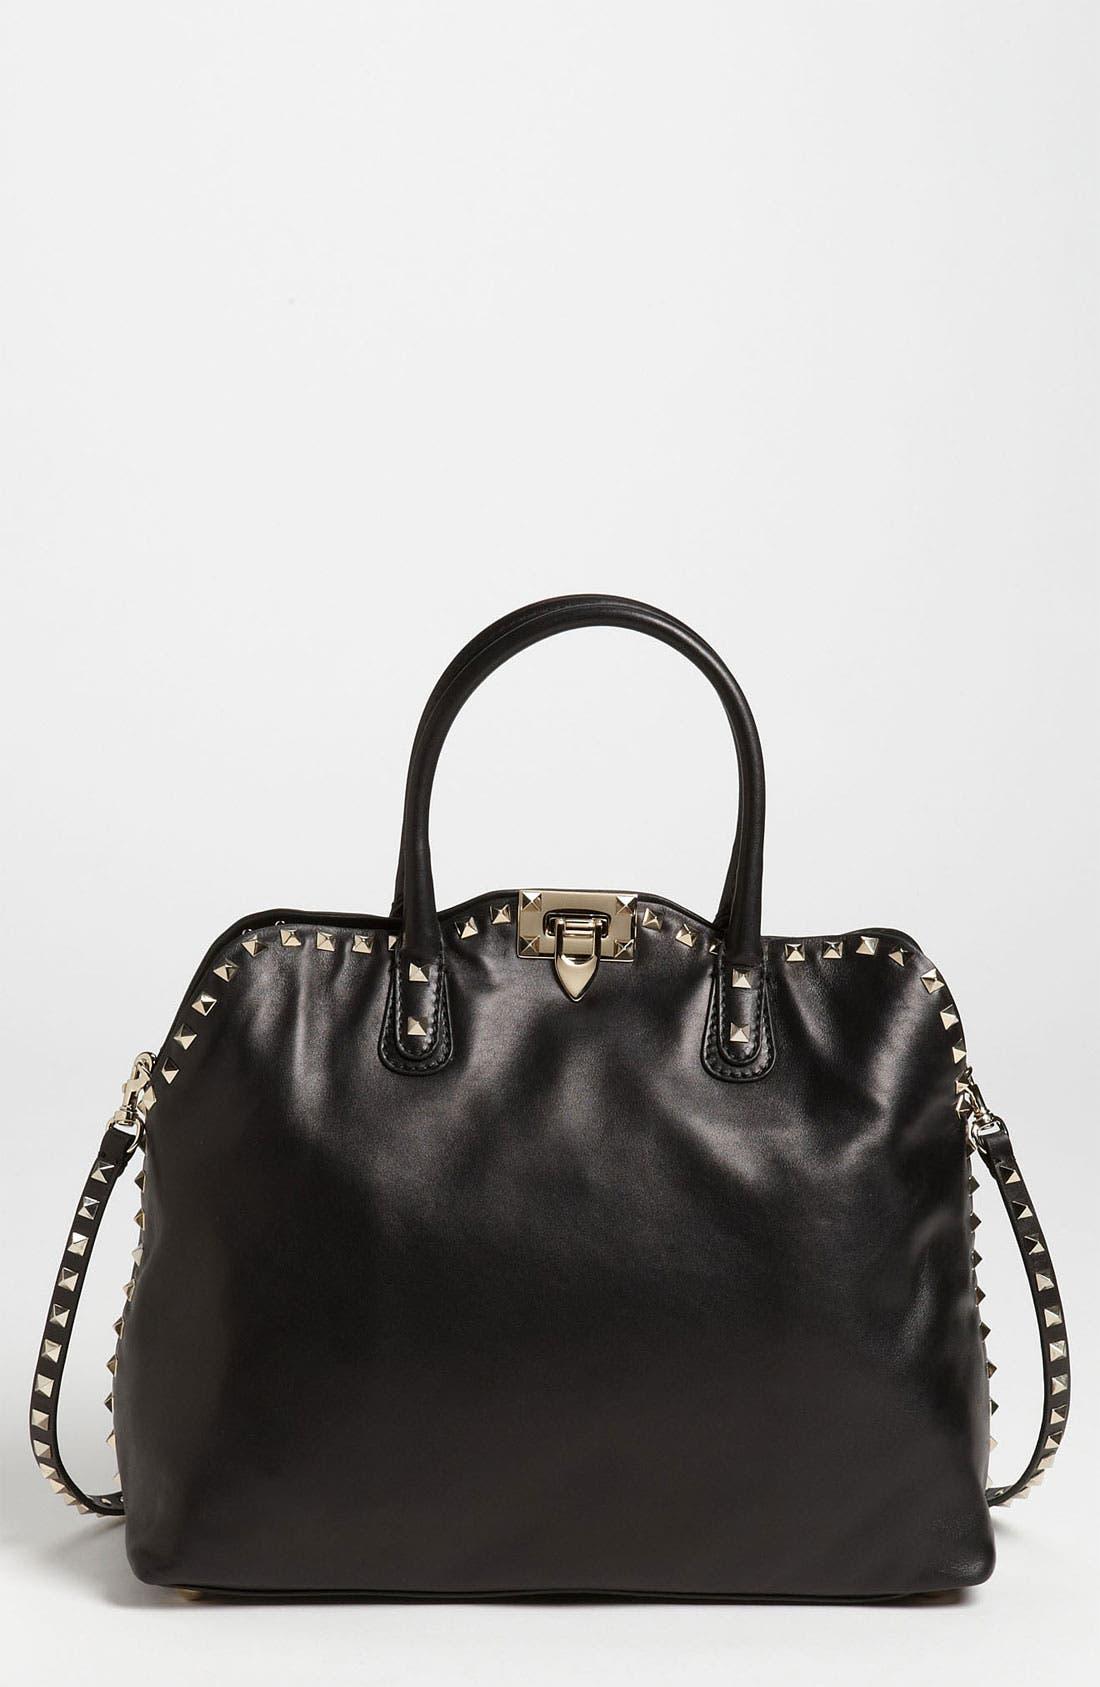 Alternate Image 1 Selected - Valentino 'Rockstud' Leather Dome Handbag